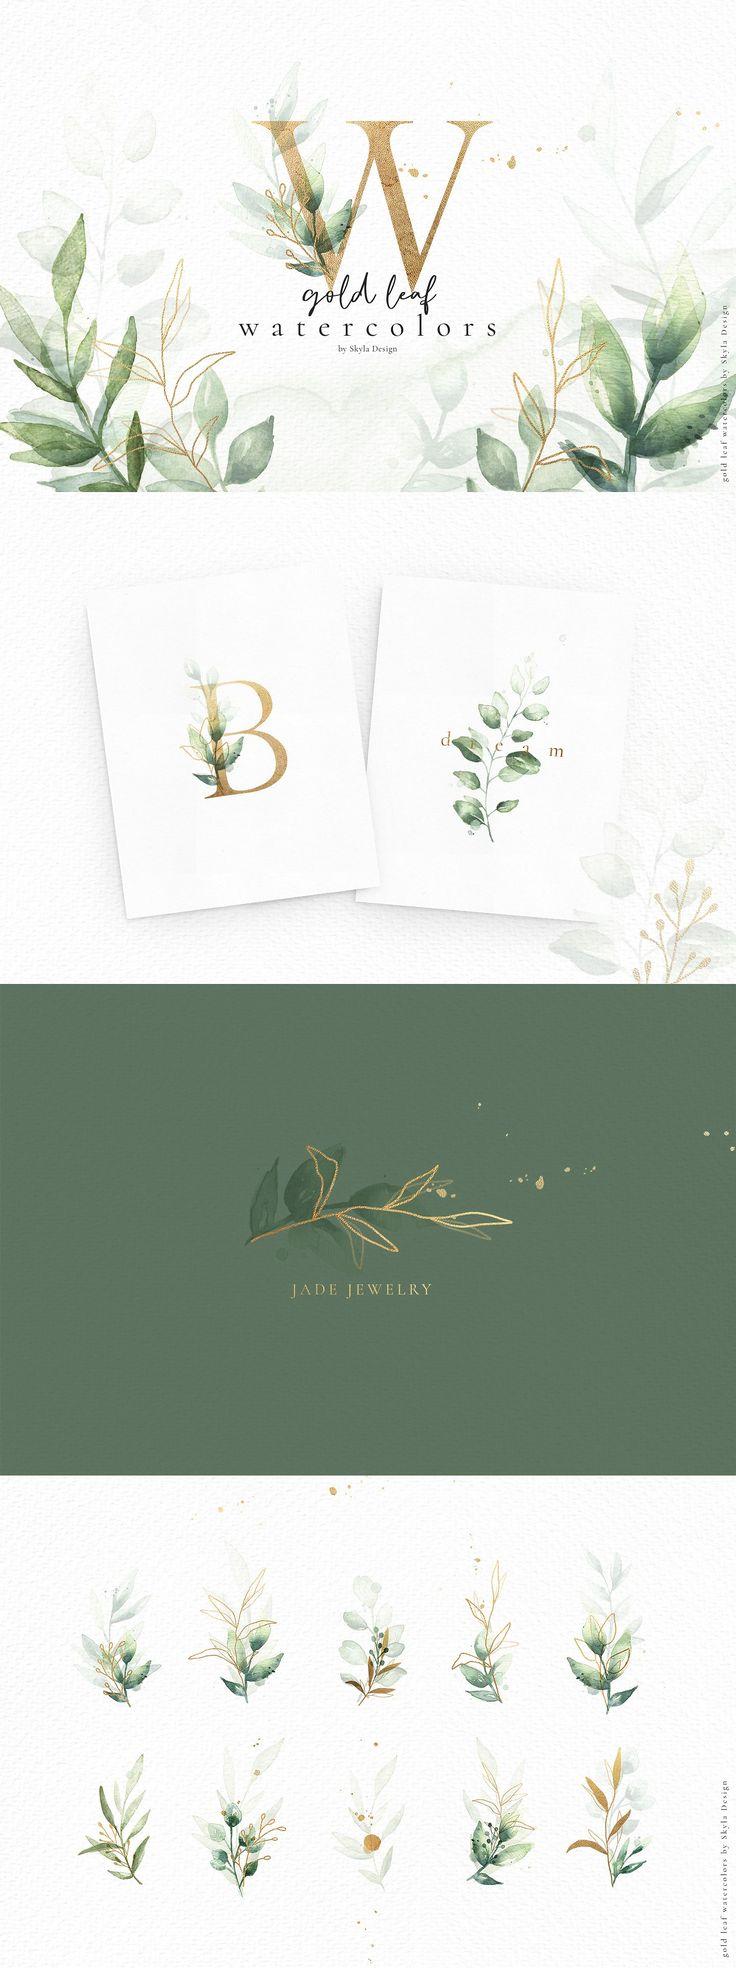 Gold leaf watercolor alphabet art